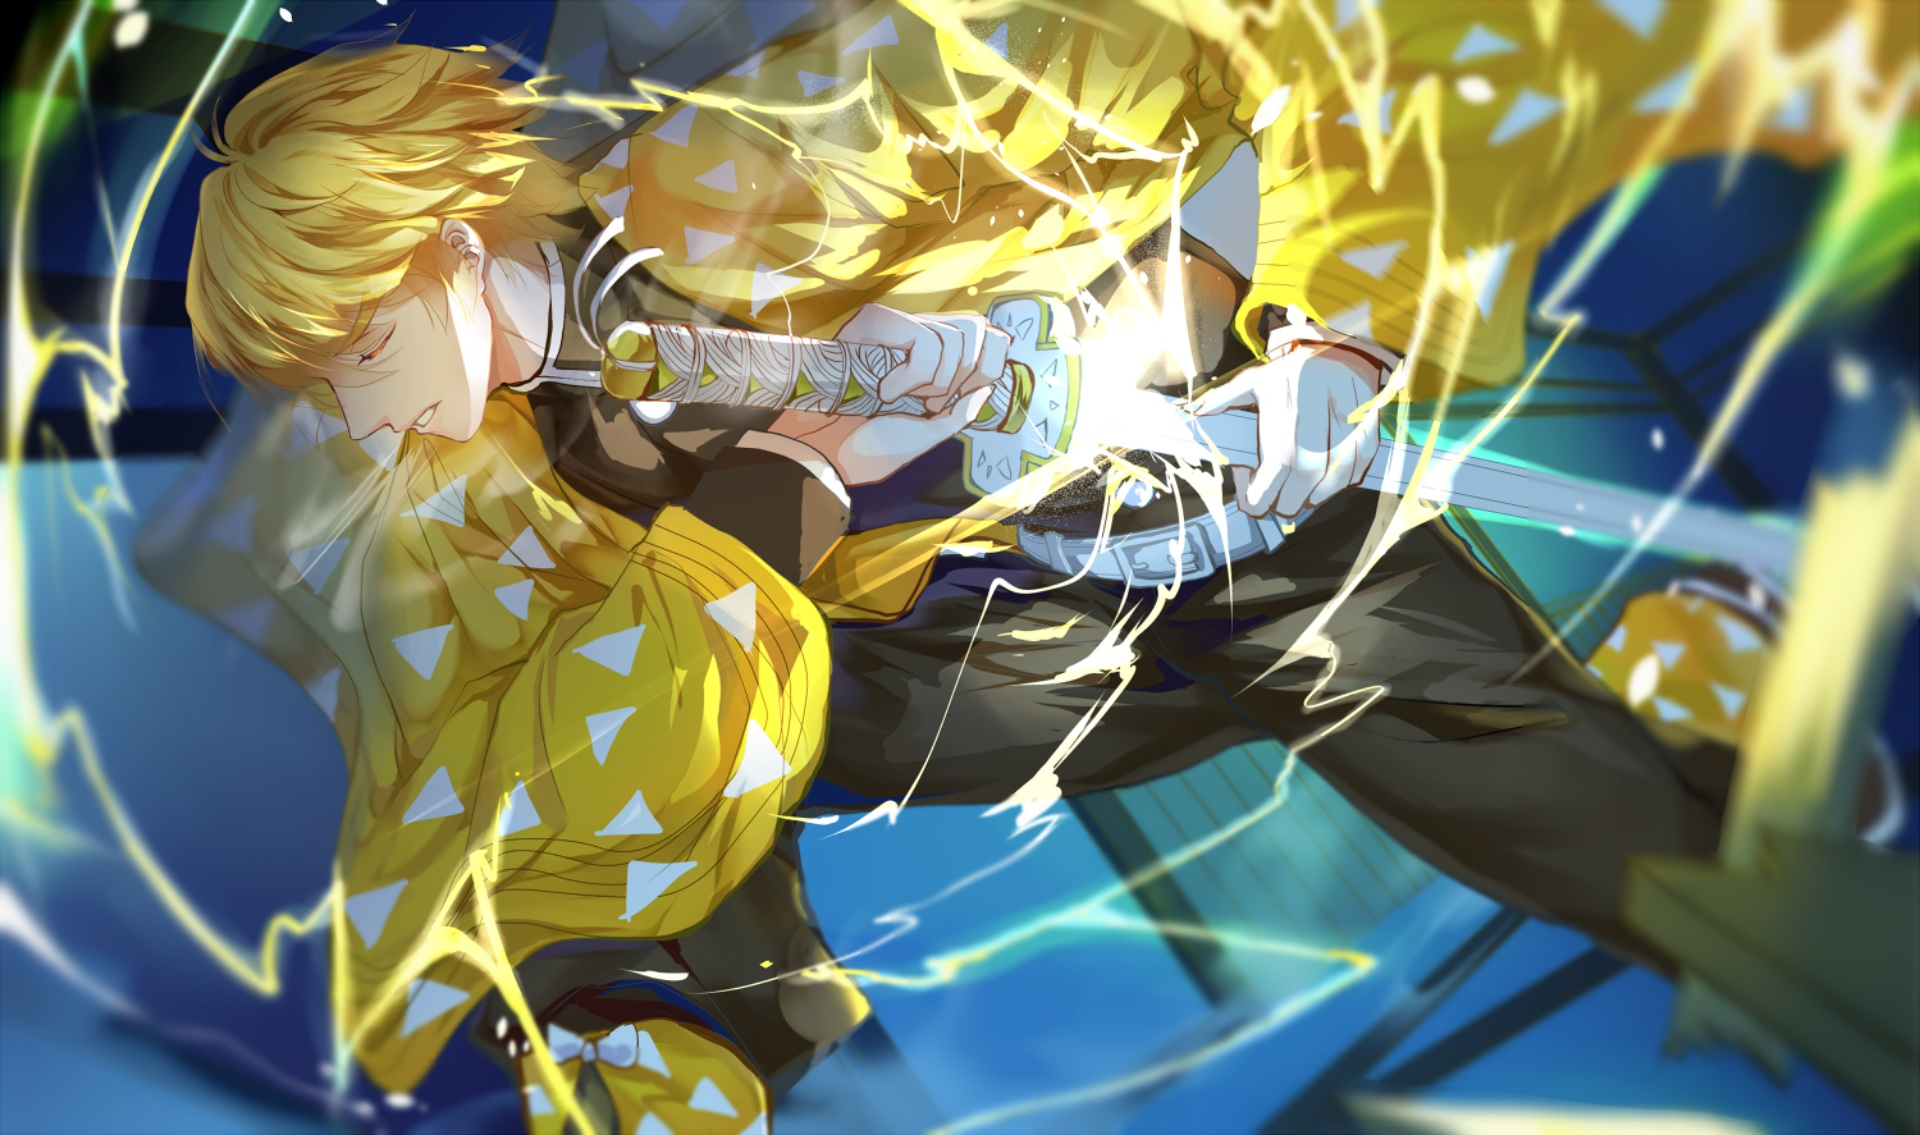 Fondos de pantalla Anime Zenitsu Agatsuma personaje Guardianes de la Noche